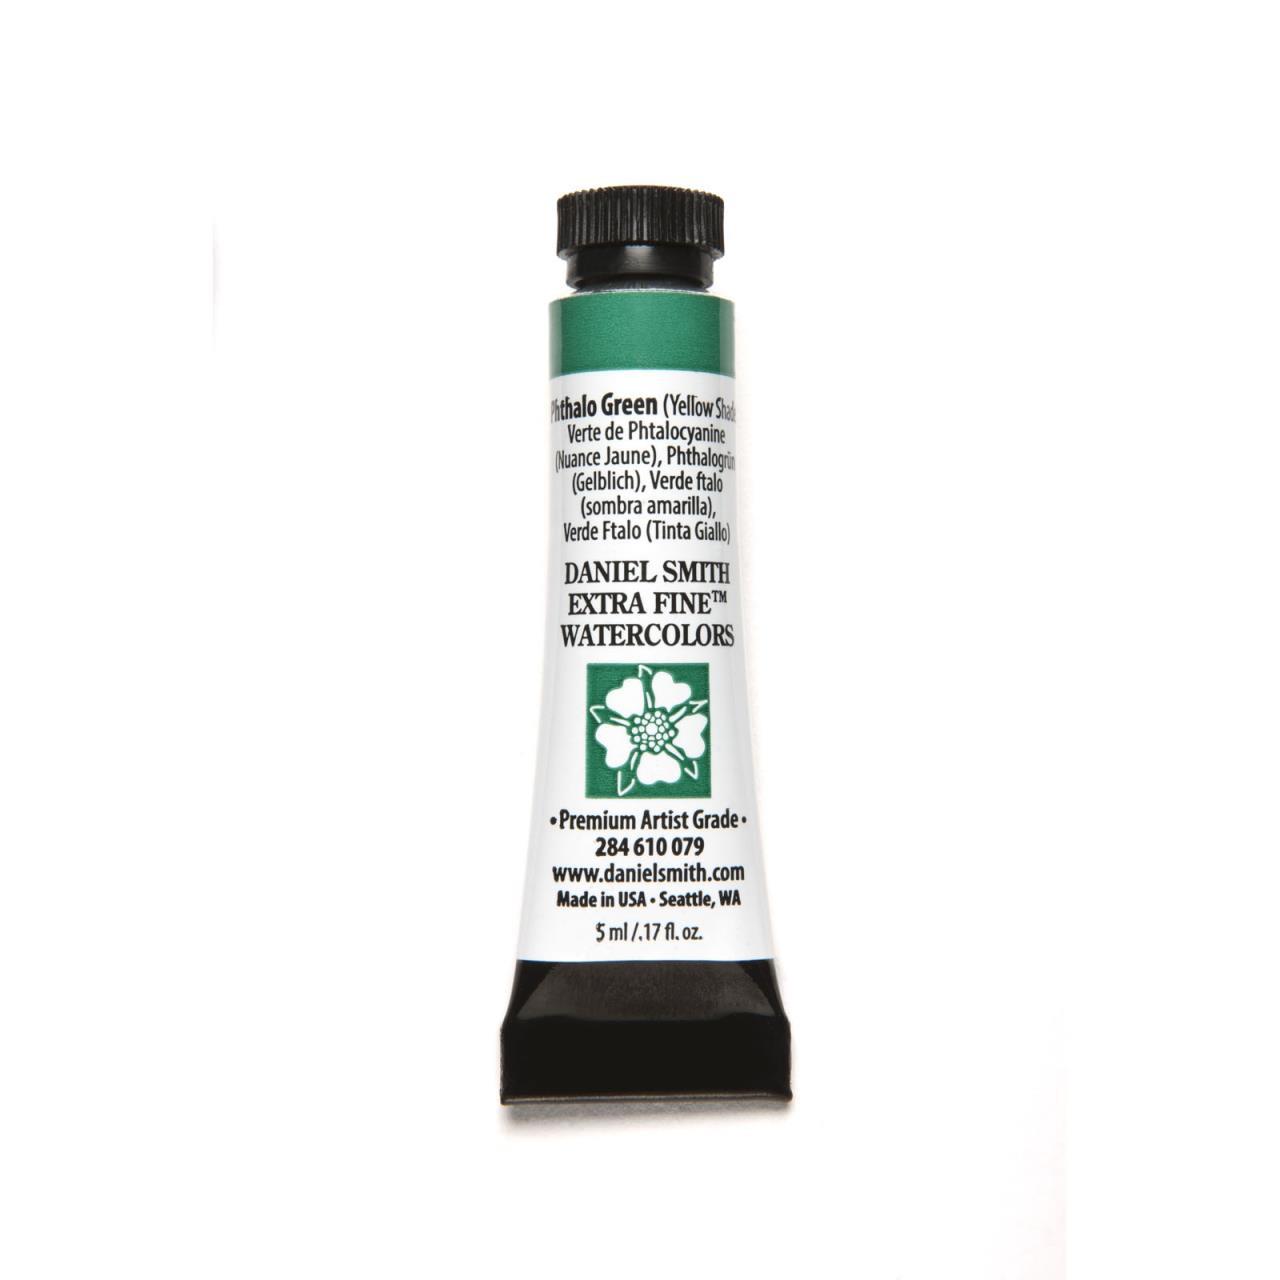 Phthalo Green - Yellow Shade, DANIEL SMITH Extra Fine Watercolors 5ml Tubes -